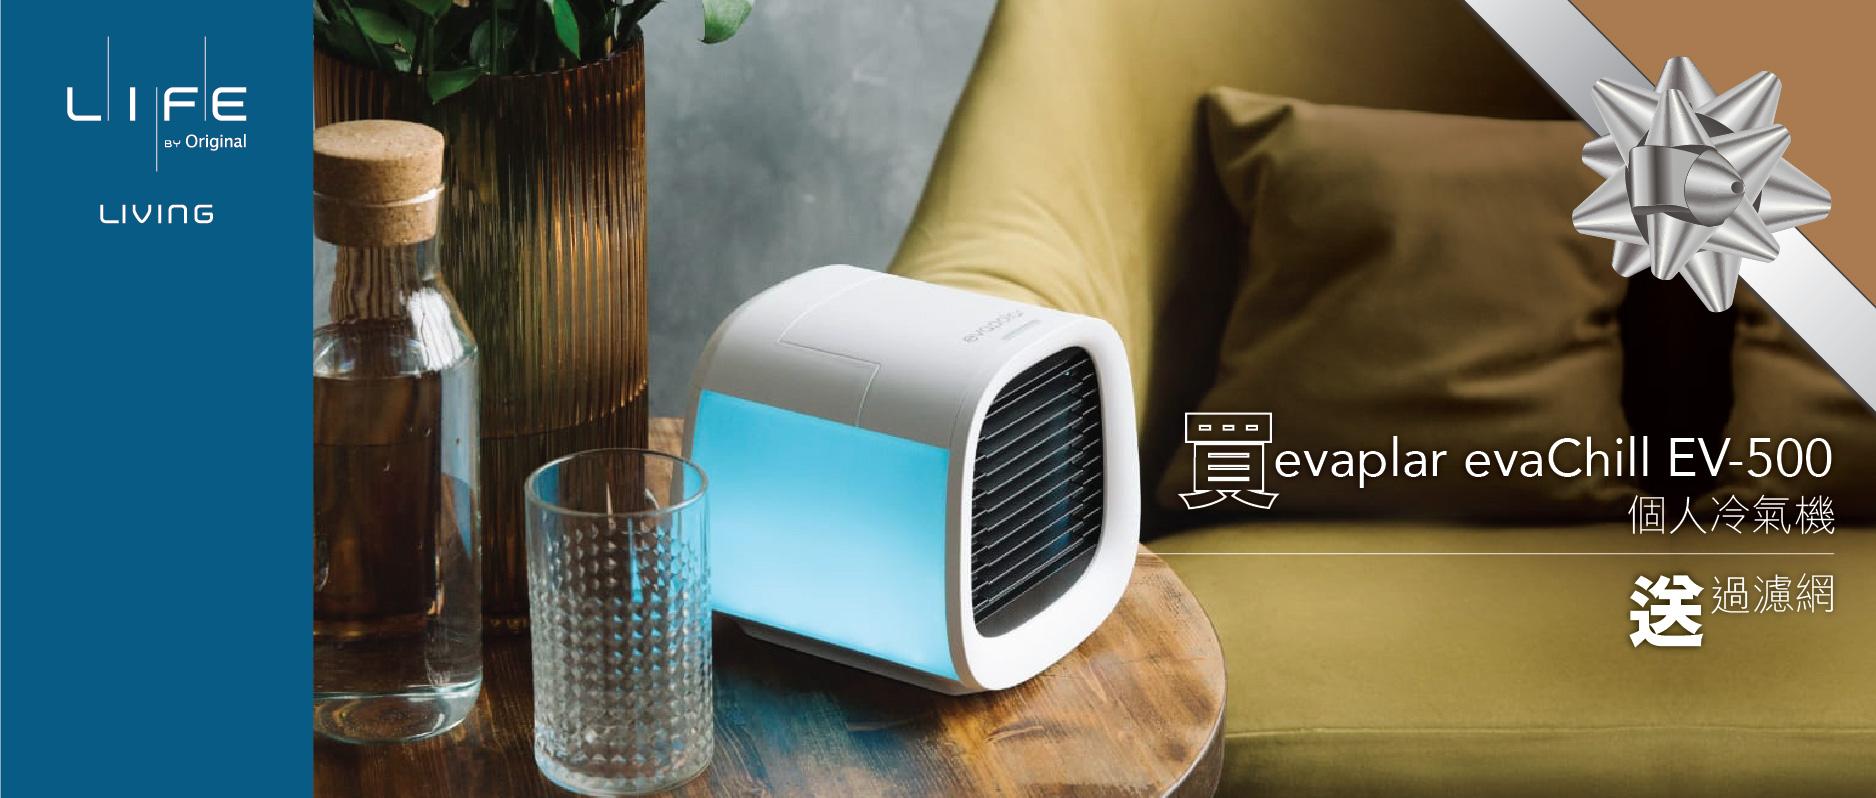 Evapolar evaCHILL EV-500 限定優惠|Limited Offer